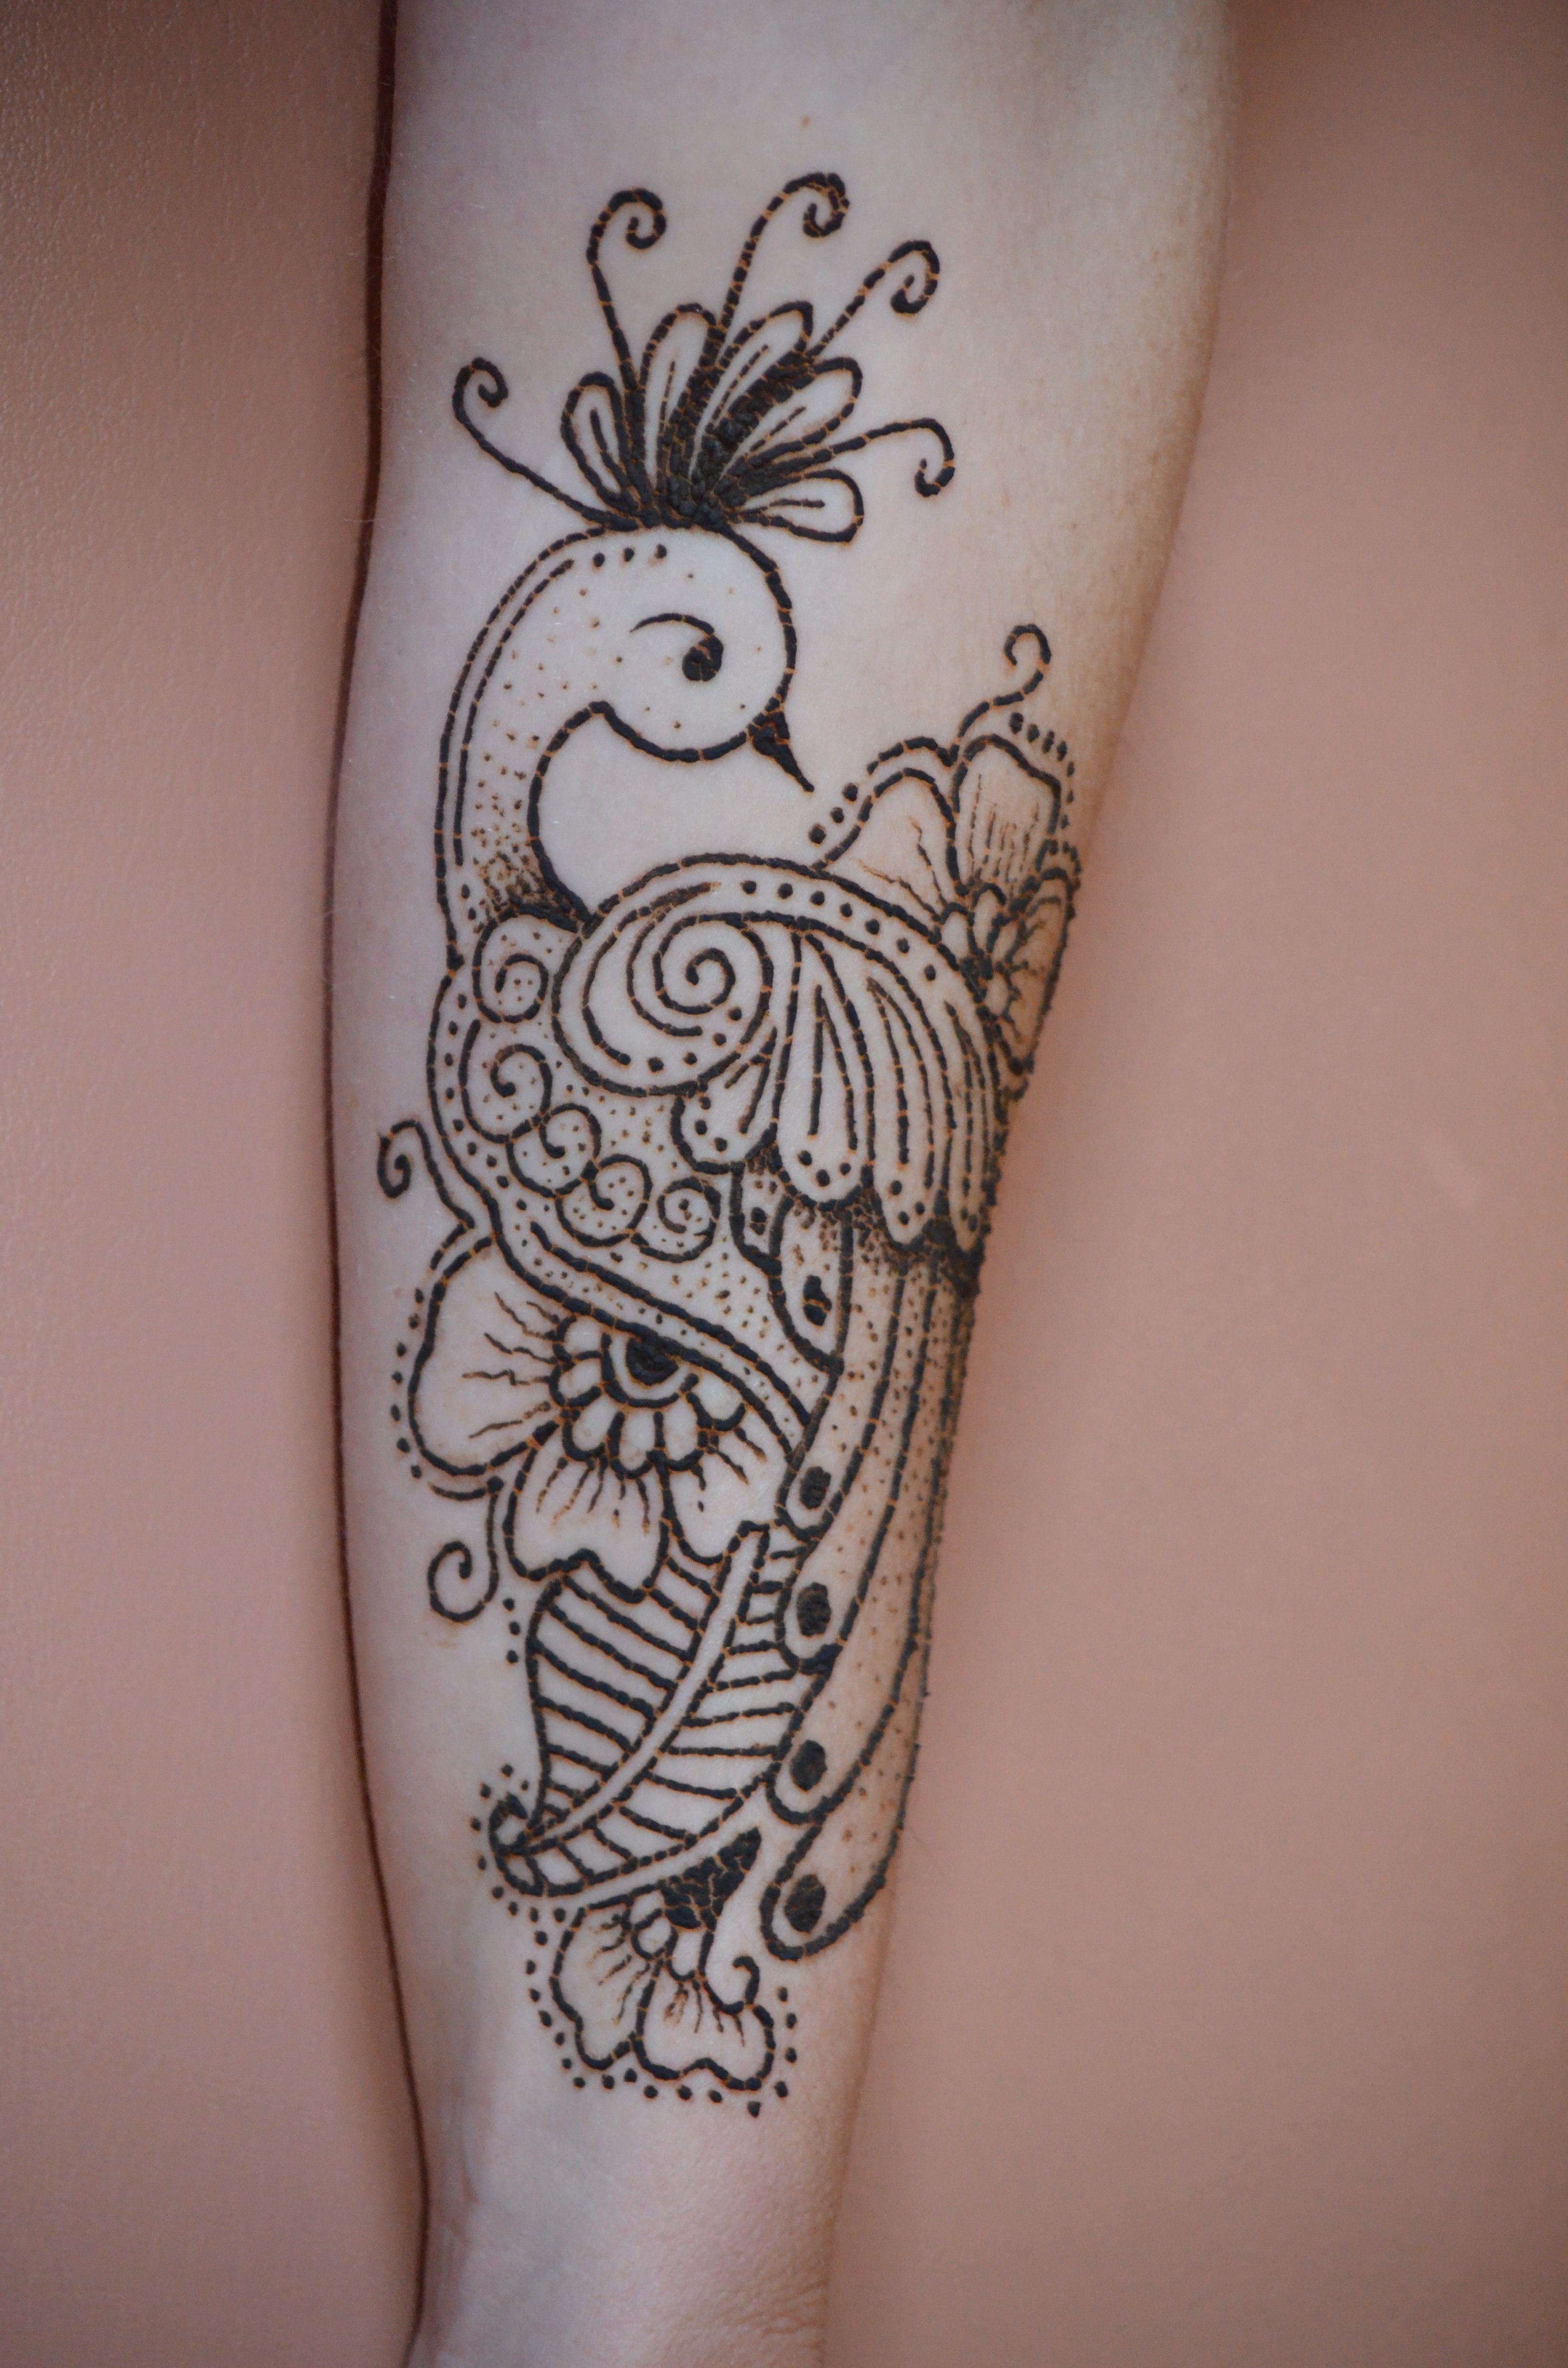 Henna Peacock Tattoo Lower Back: Henna Peacock Tattoo.